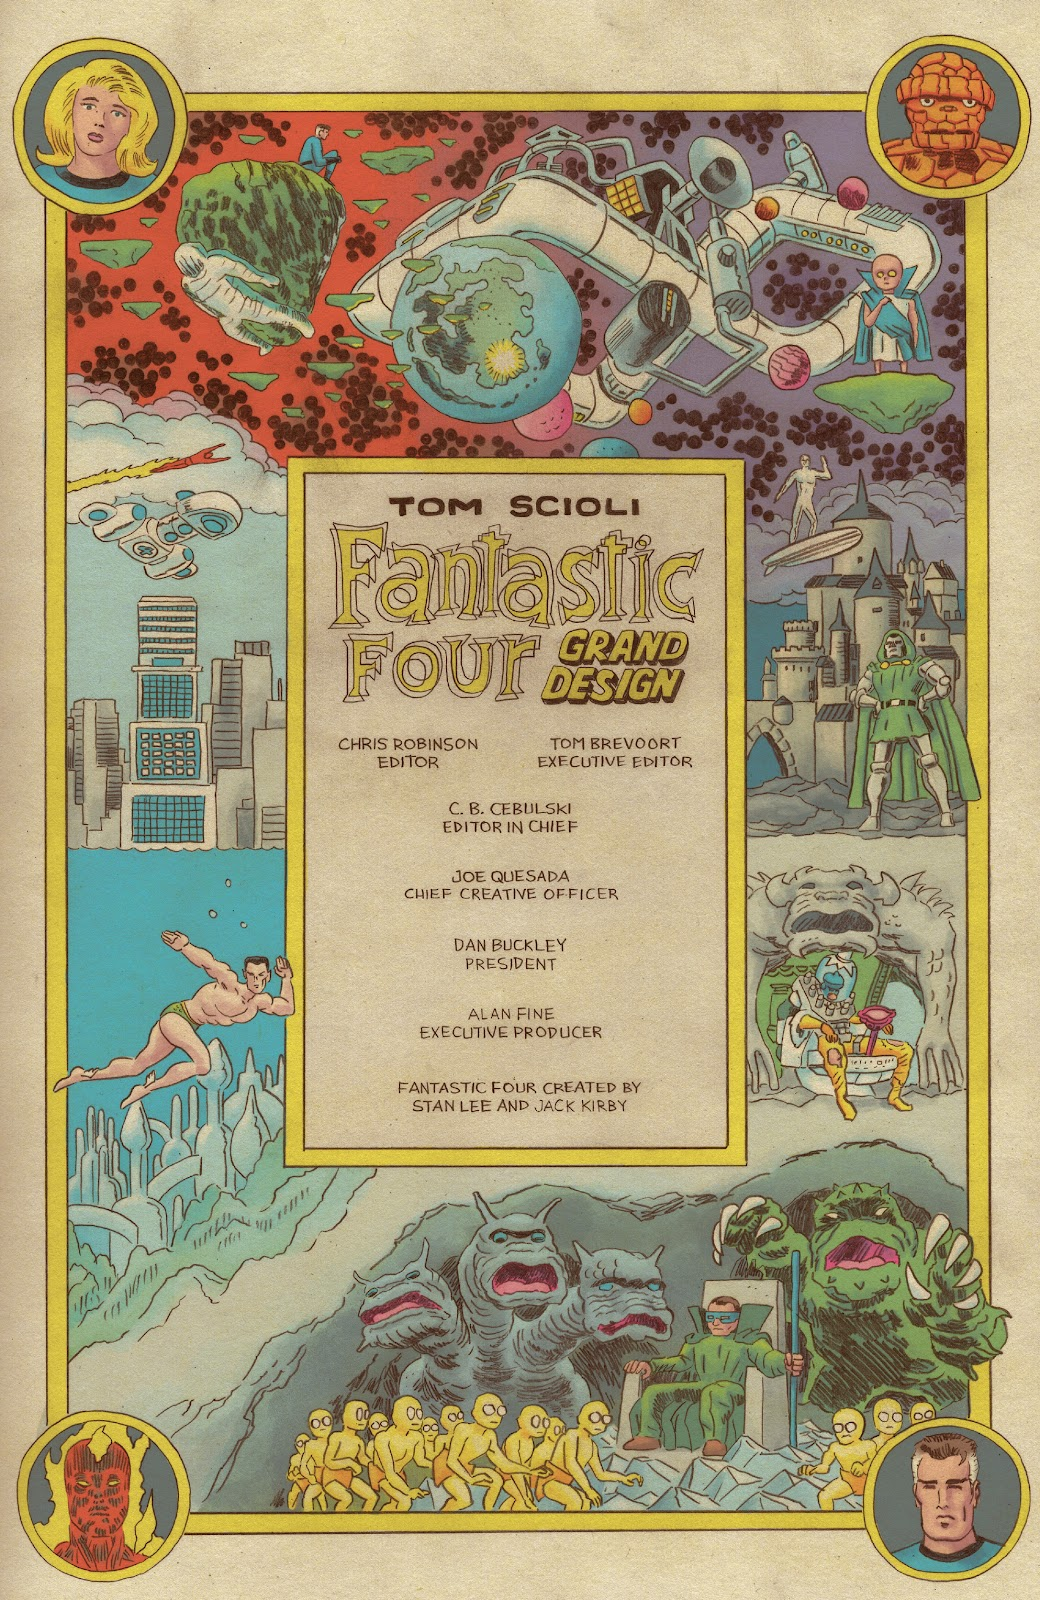 Read online Fantastic Four: Grand Design comic -  Issue #1 - 2